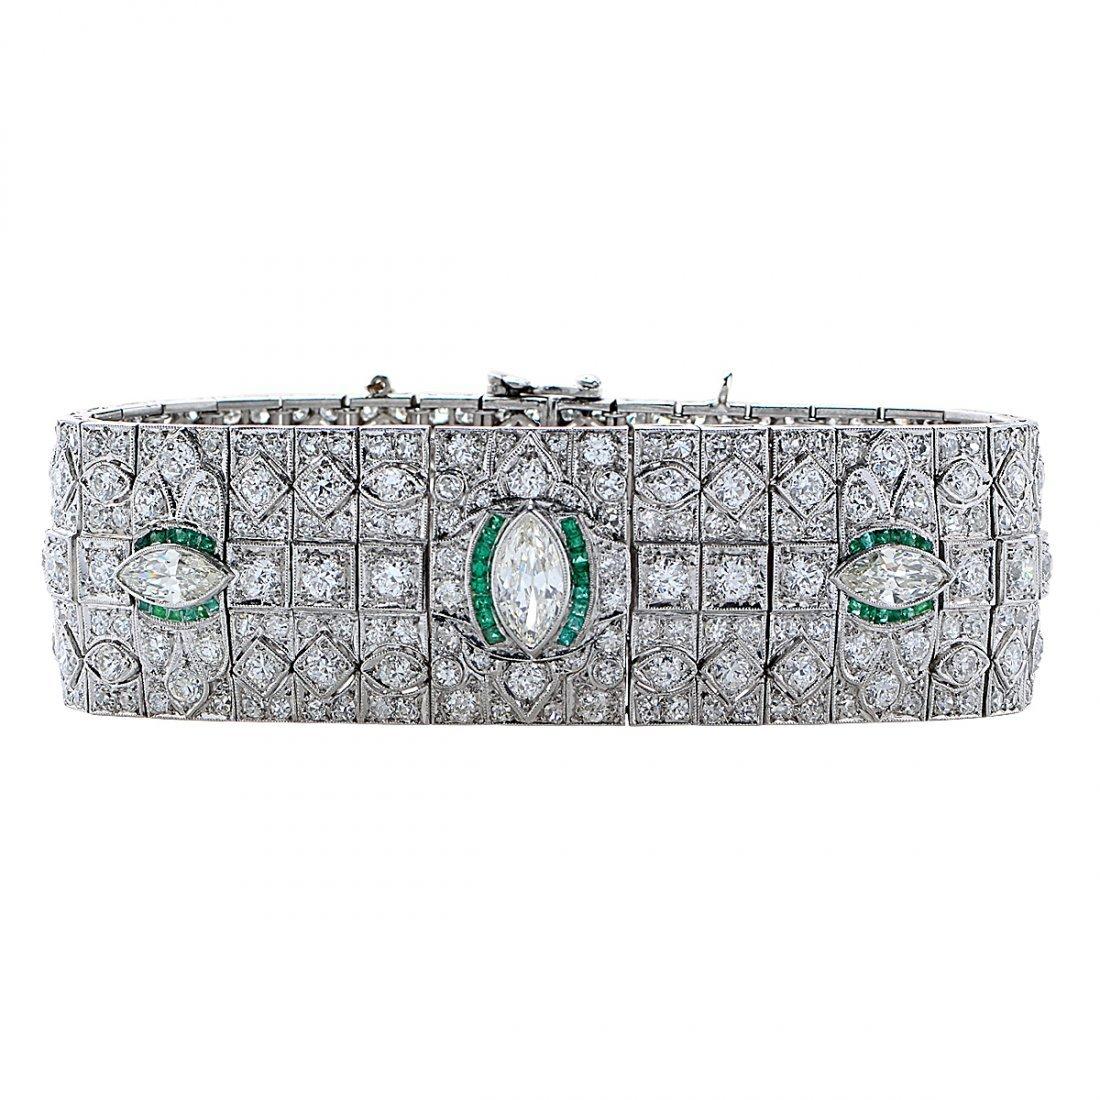 25ct Diamond Bracelet